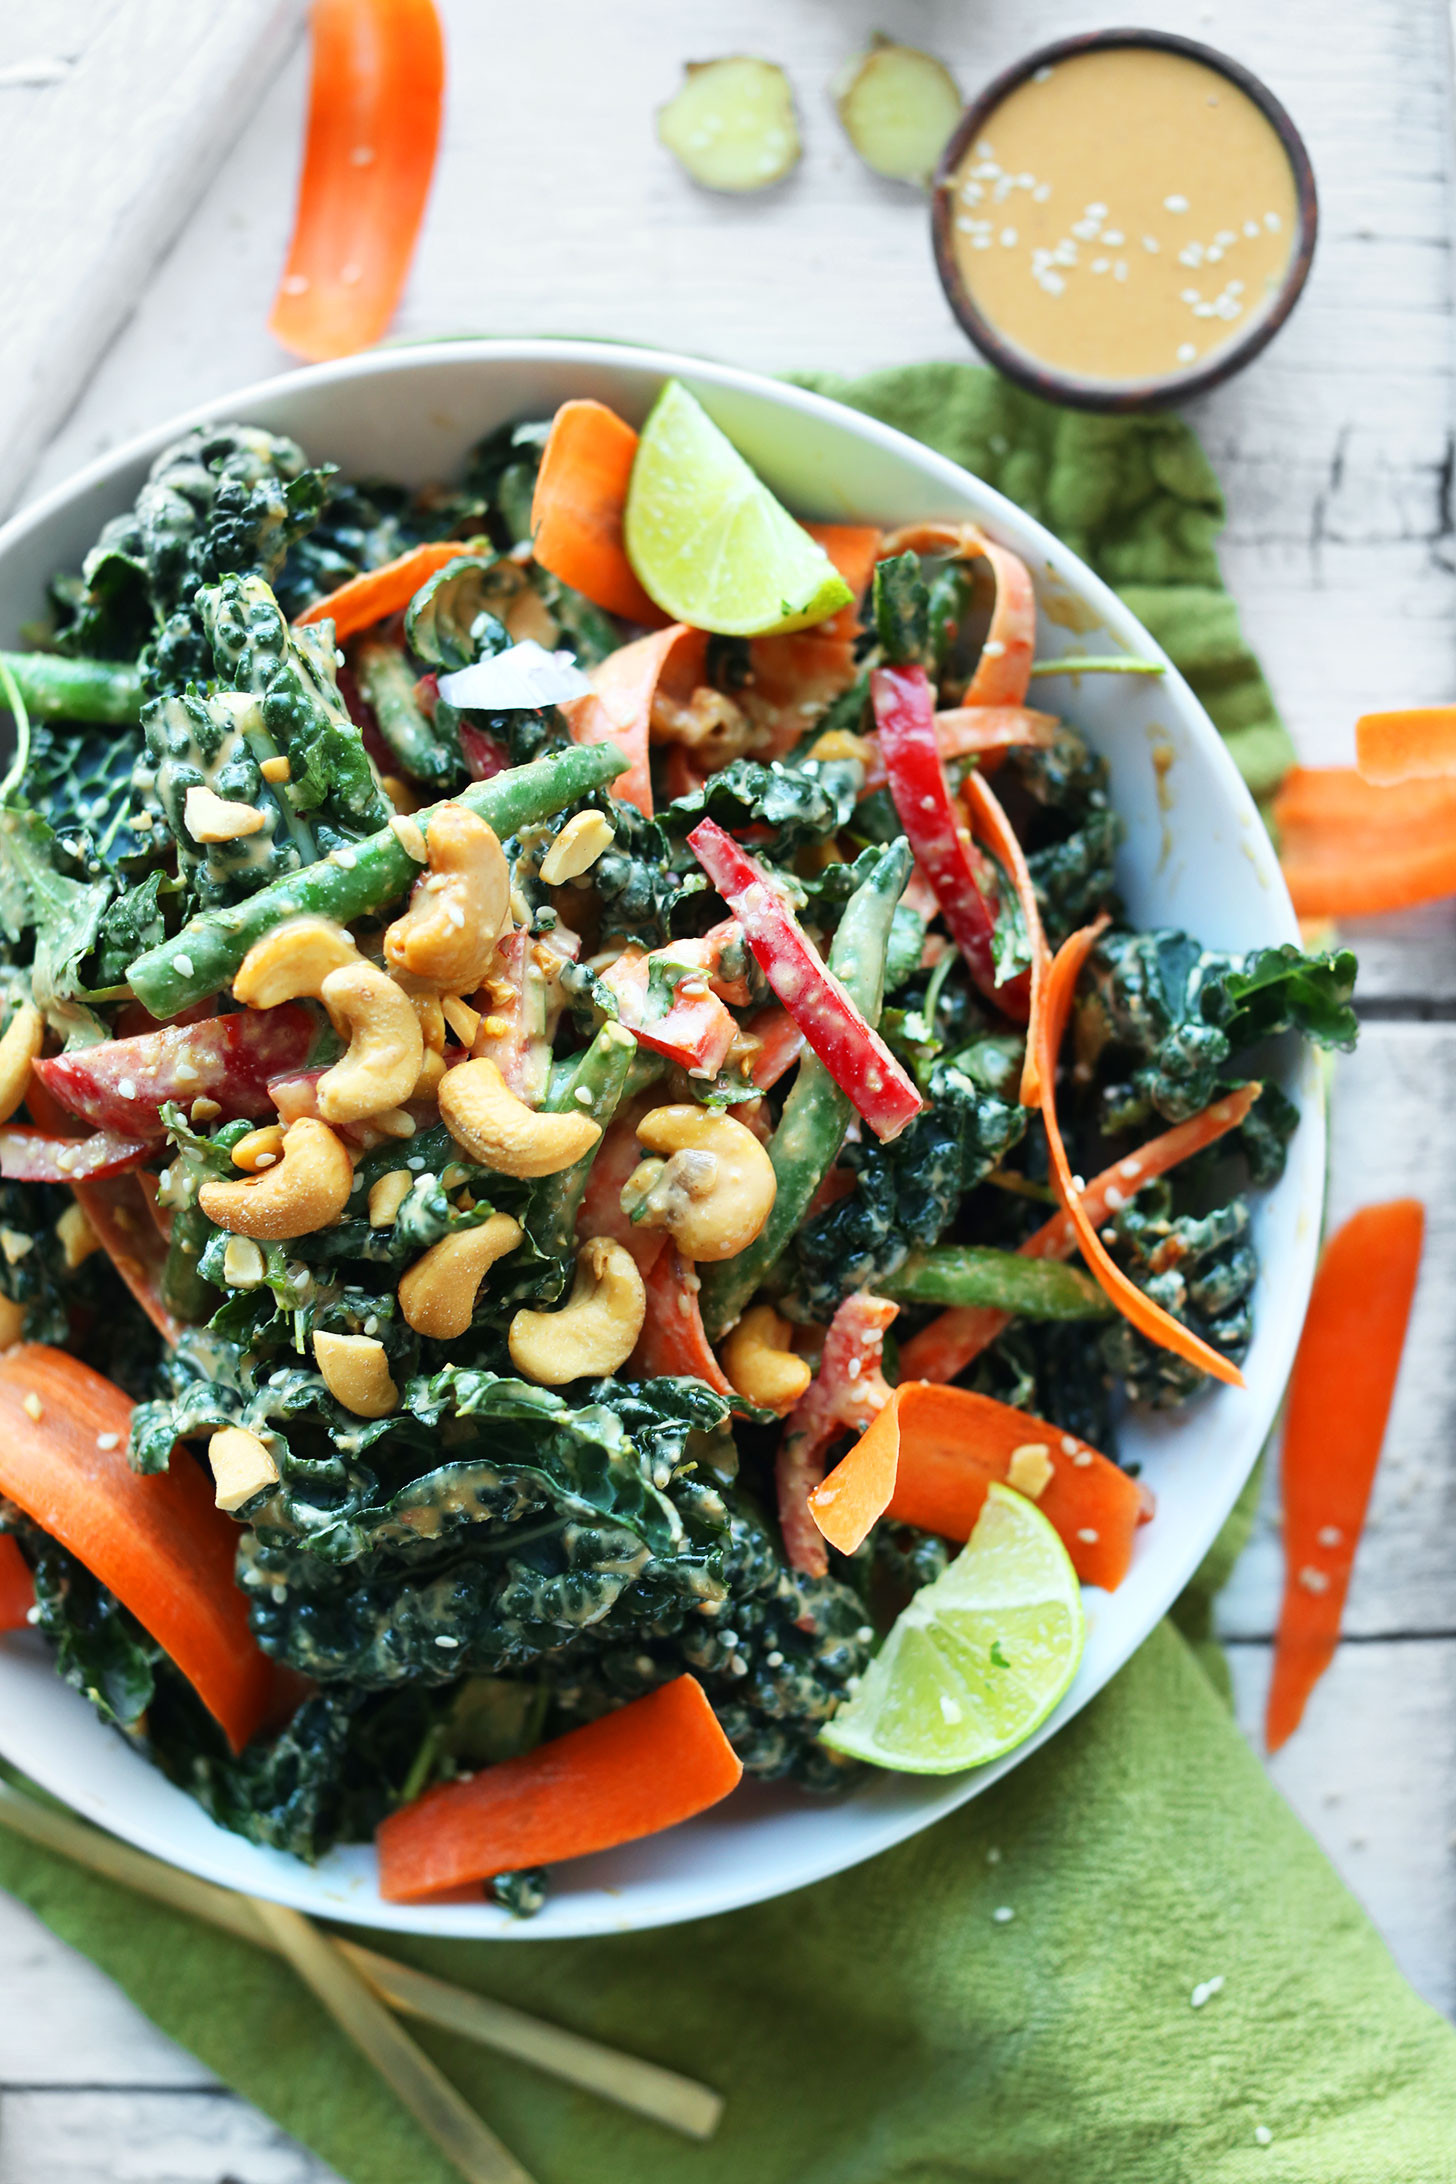 Healthy Vegan Salads  Thai Kale Salad with Cashew Dressing